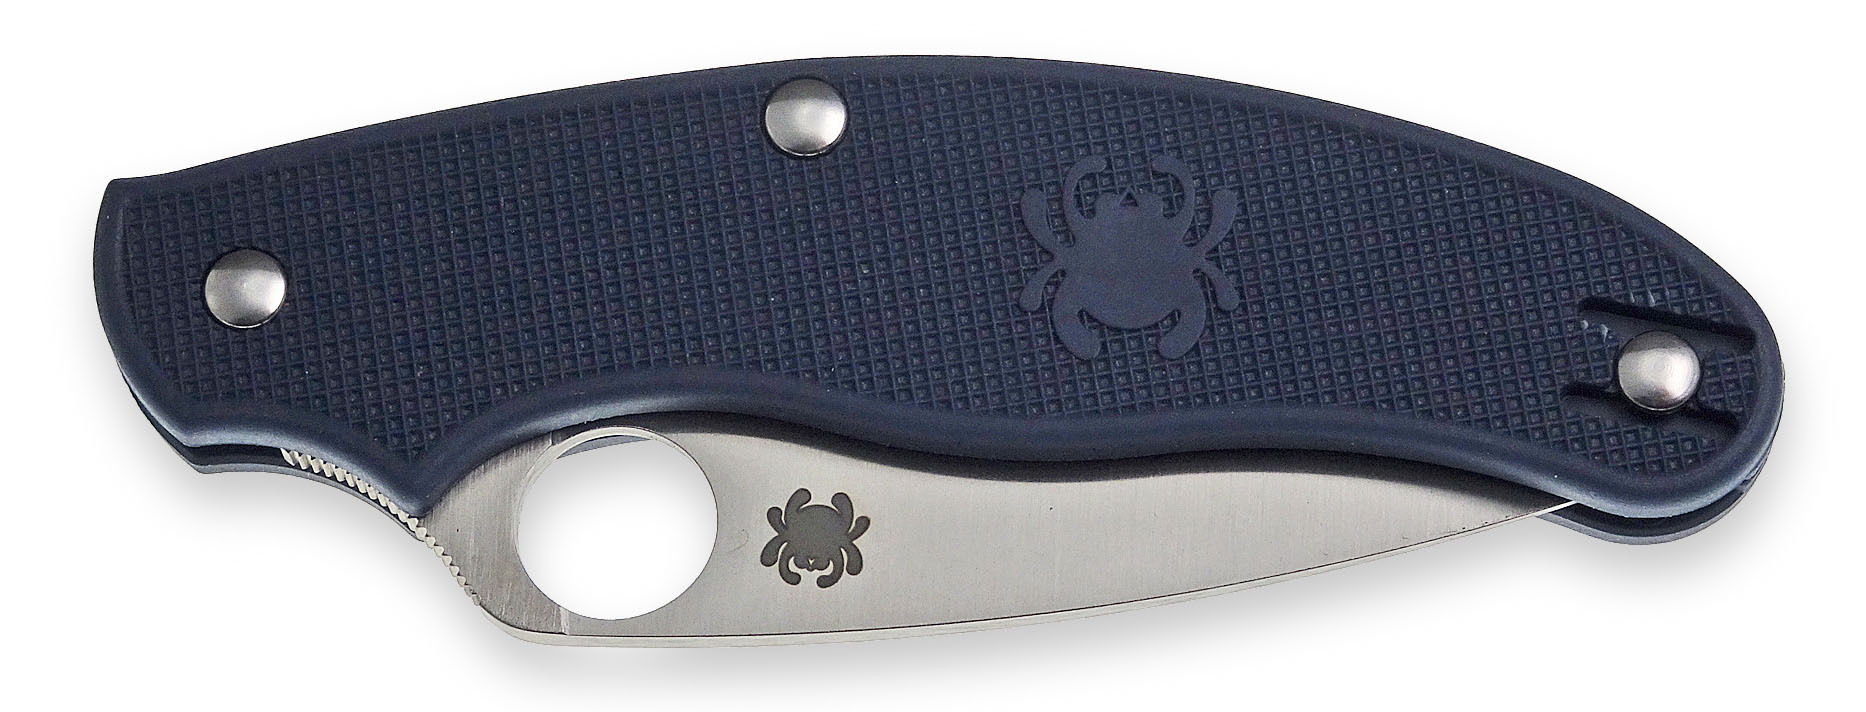 Spyderco UK Penknife Blue - outdoormesser.de